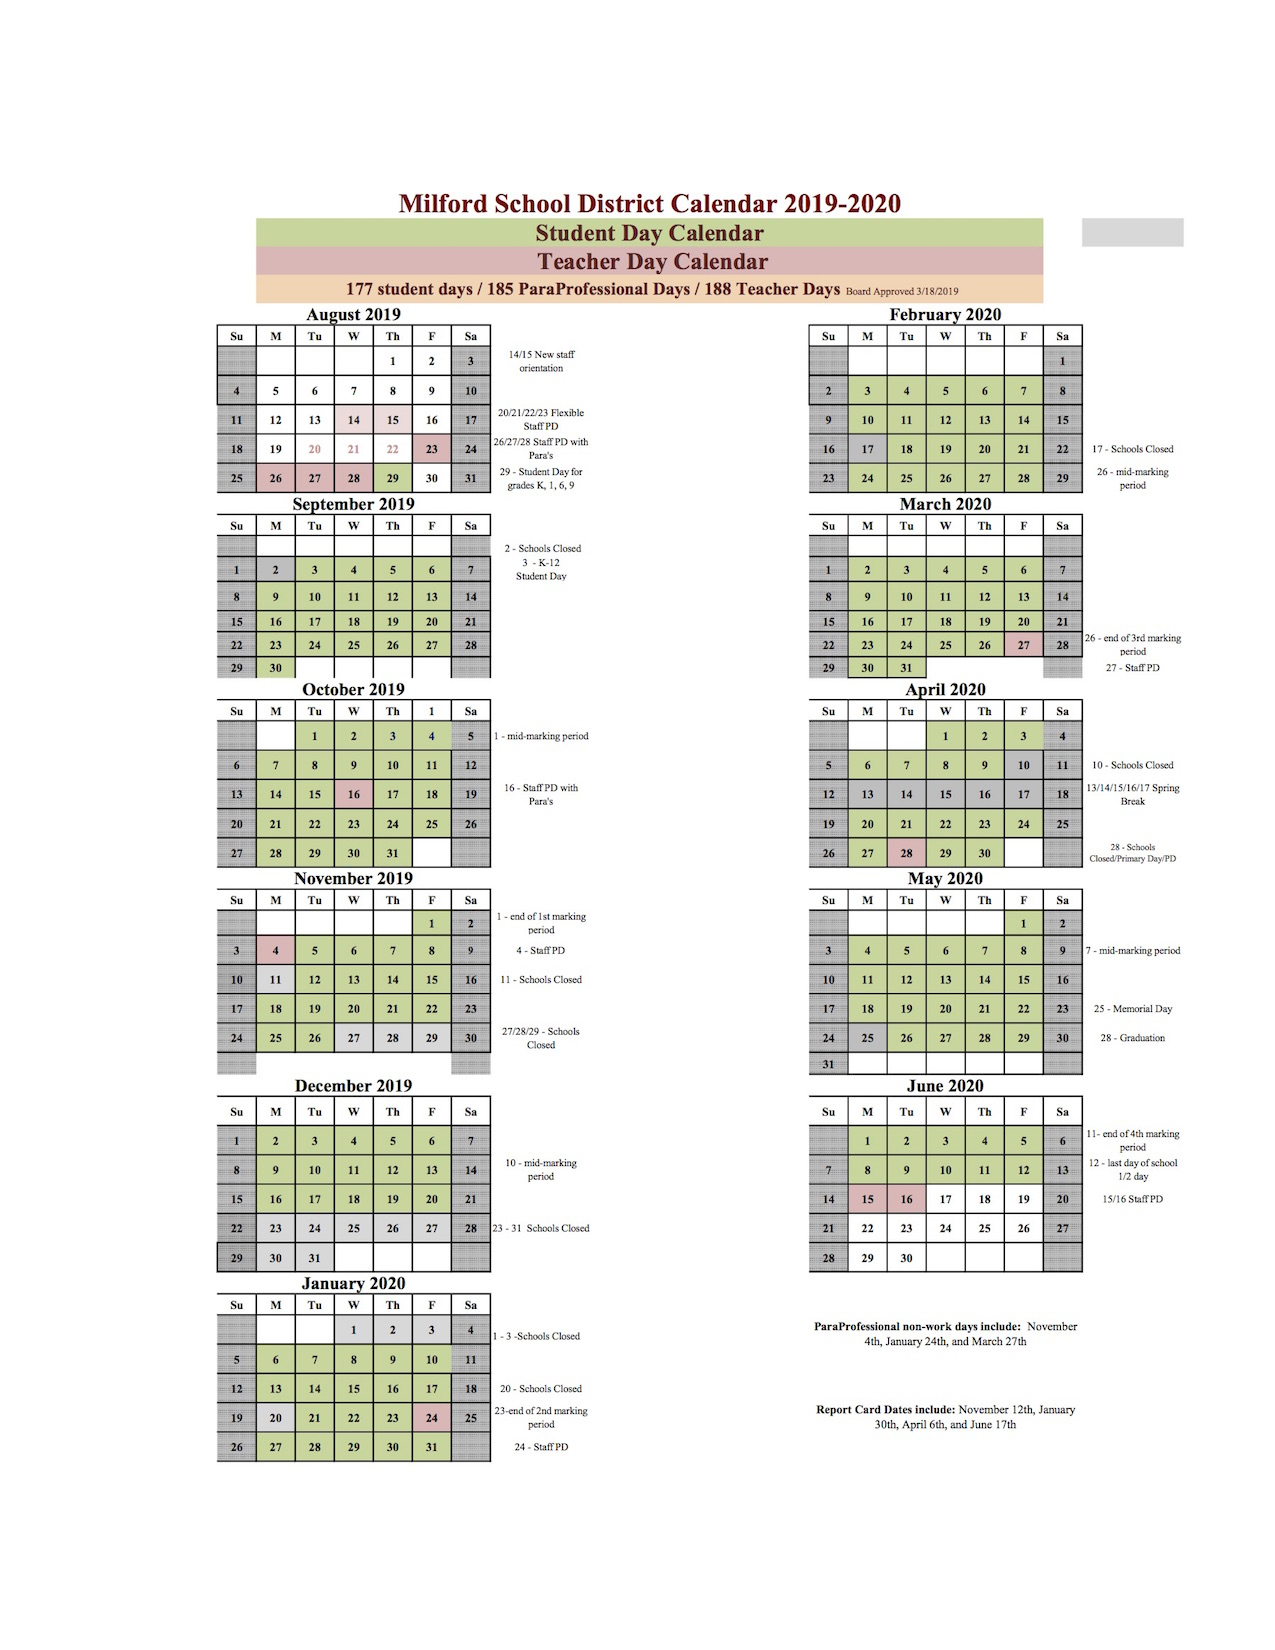 Home - Academic Calendar - Milford School District Regarding Delaware State Univeristy Calander